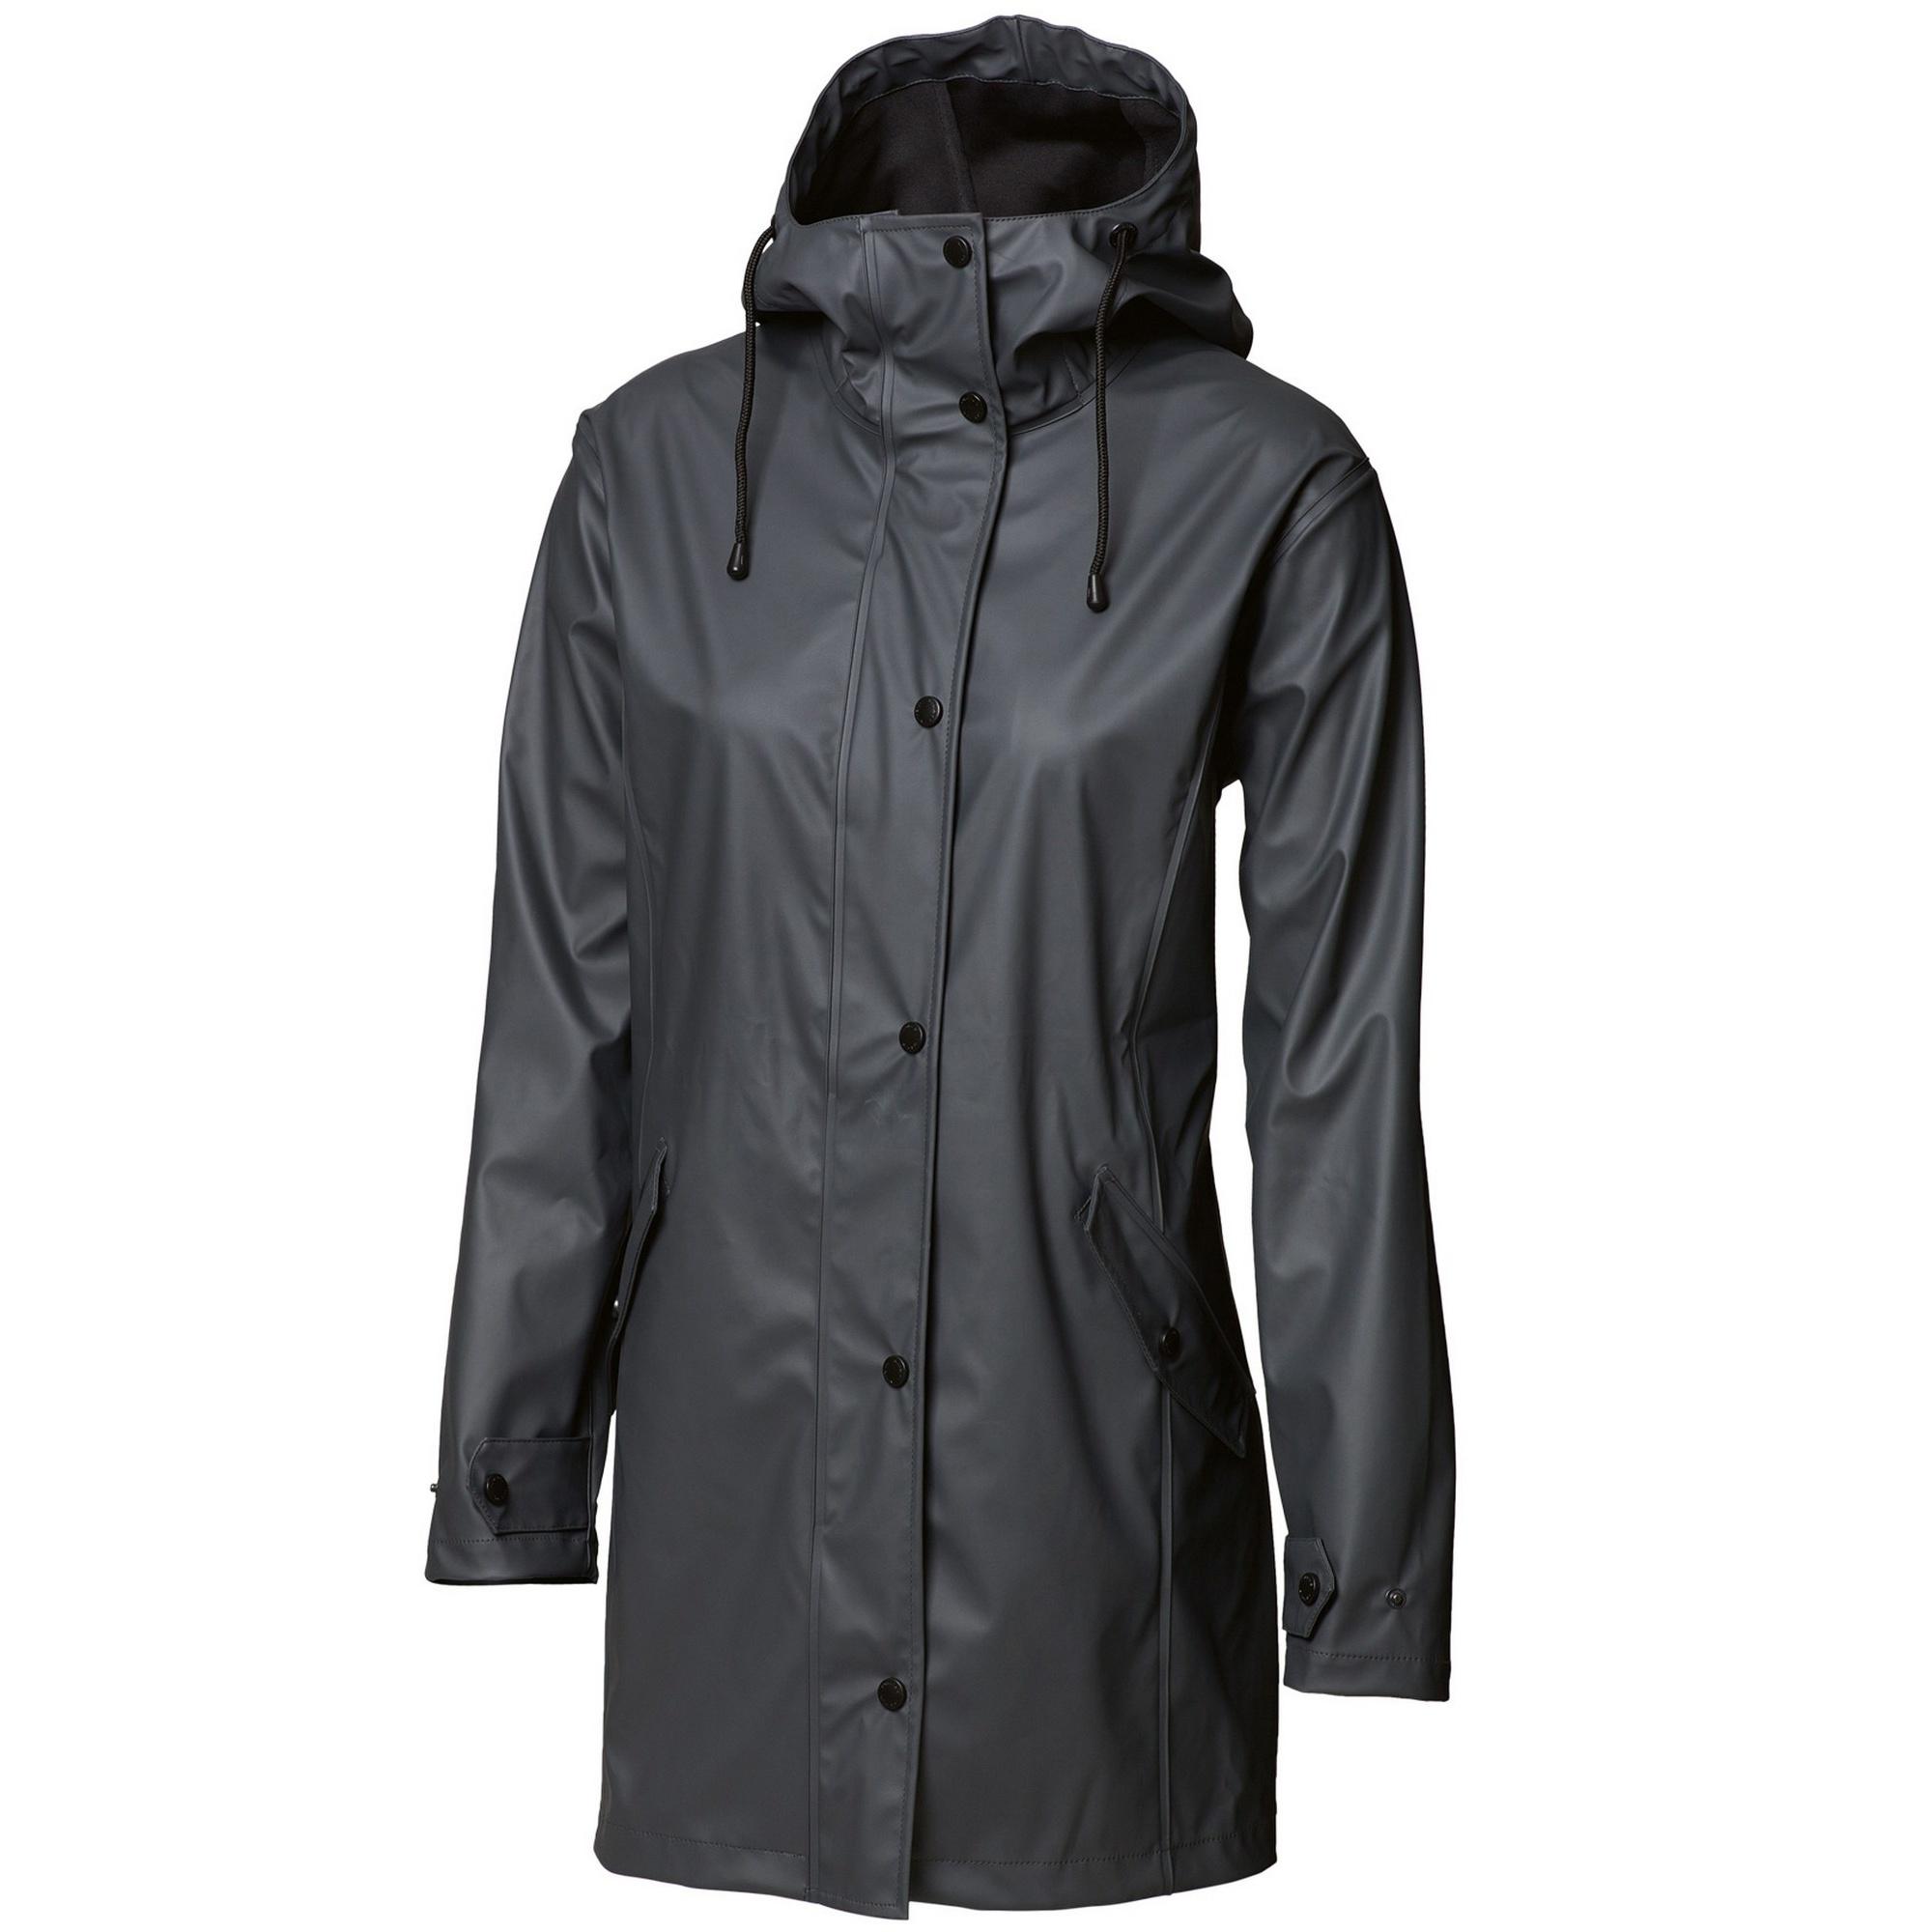 Nimbus Womens/Ladies Huntington Hooded Waterproof Fashion Raincoat (XS) (Charcoal)